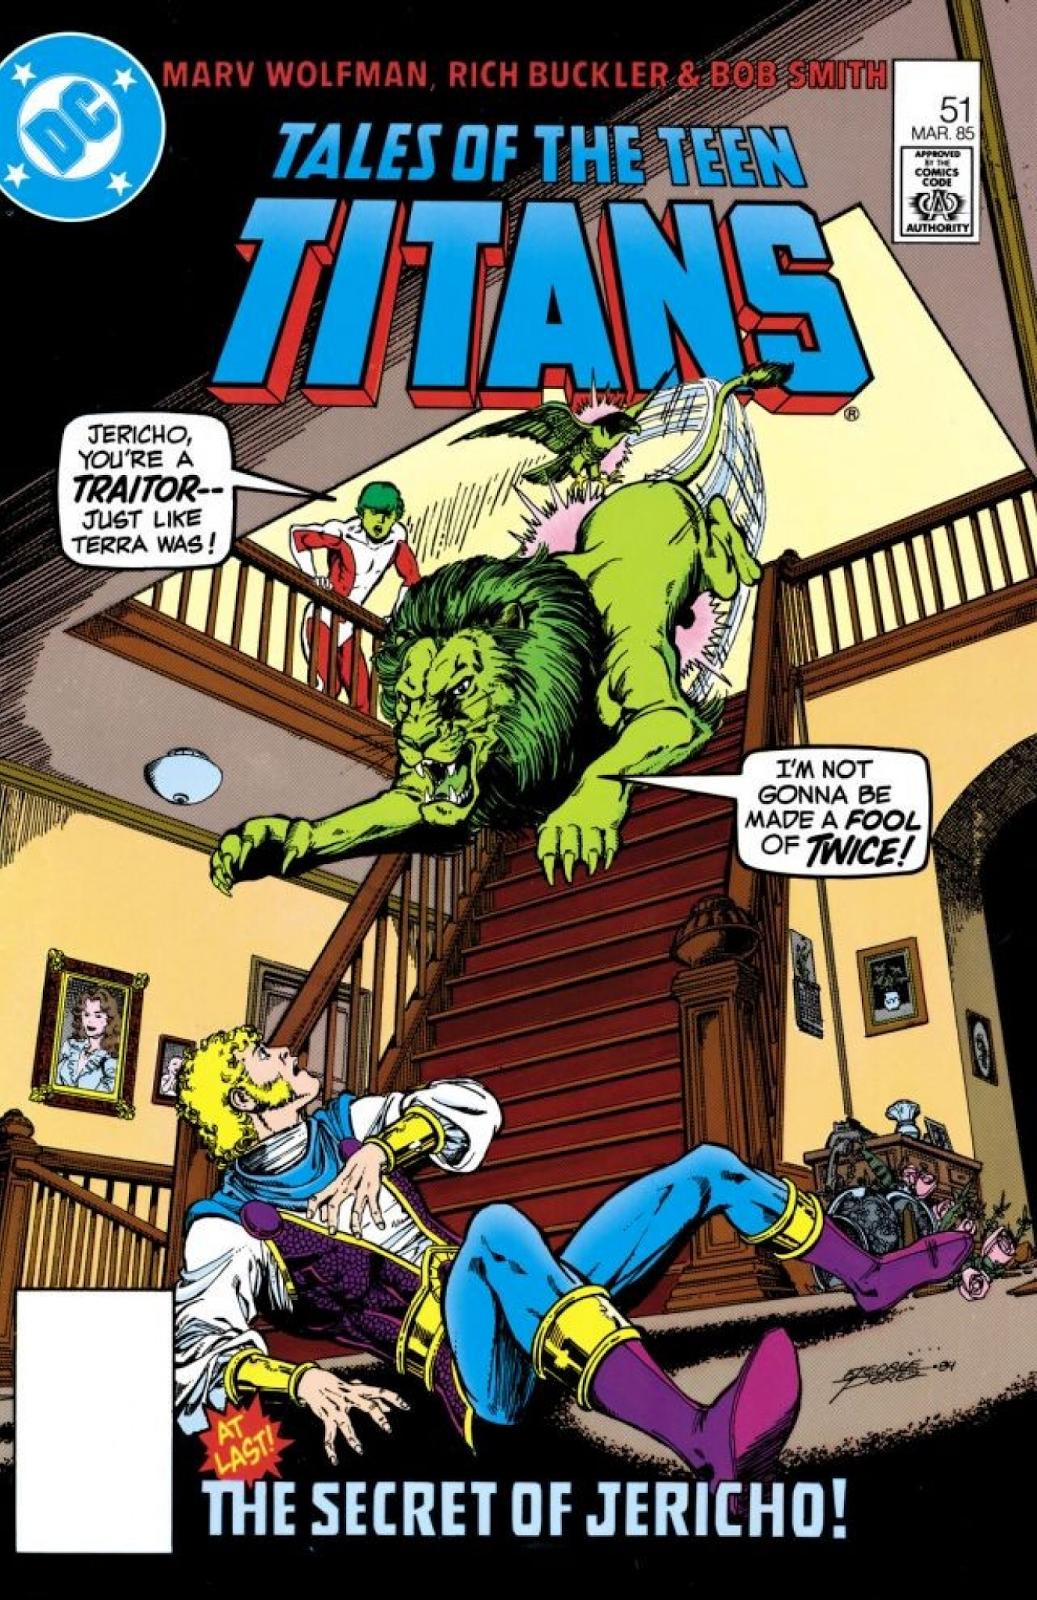 make-the-teen-titans